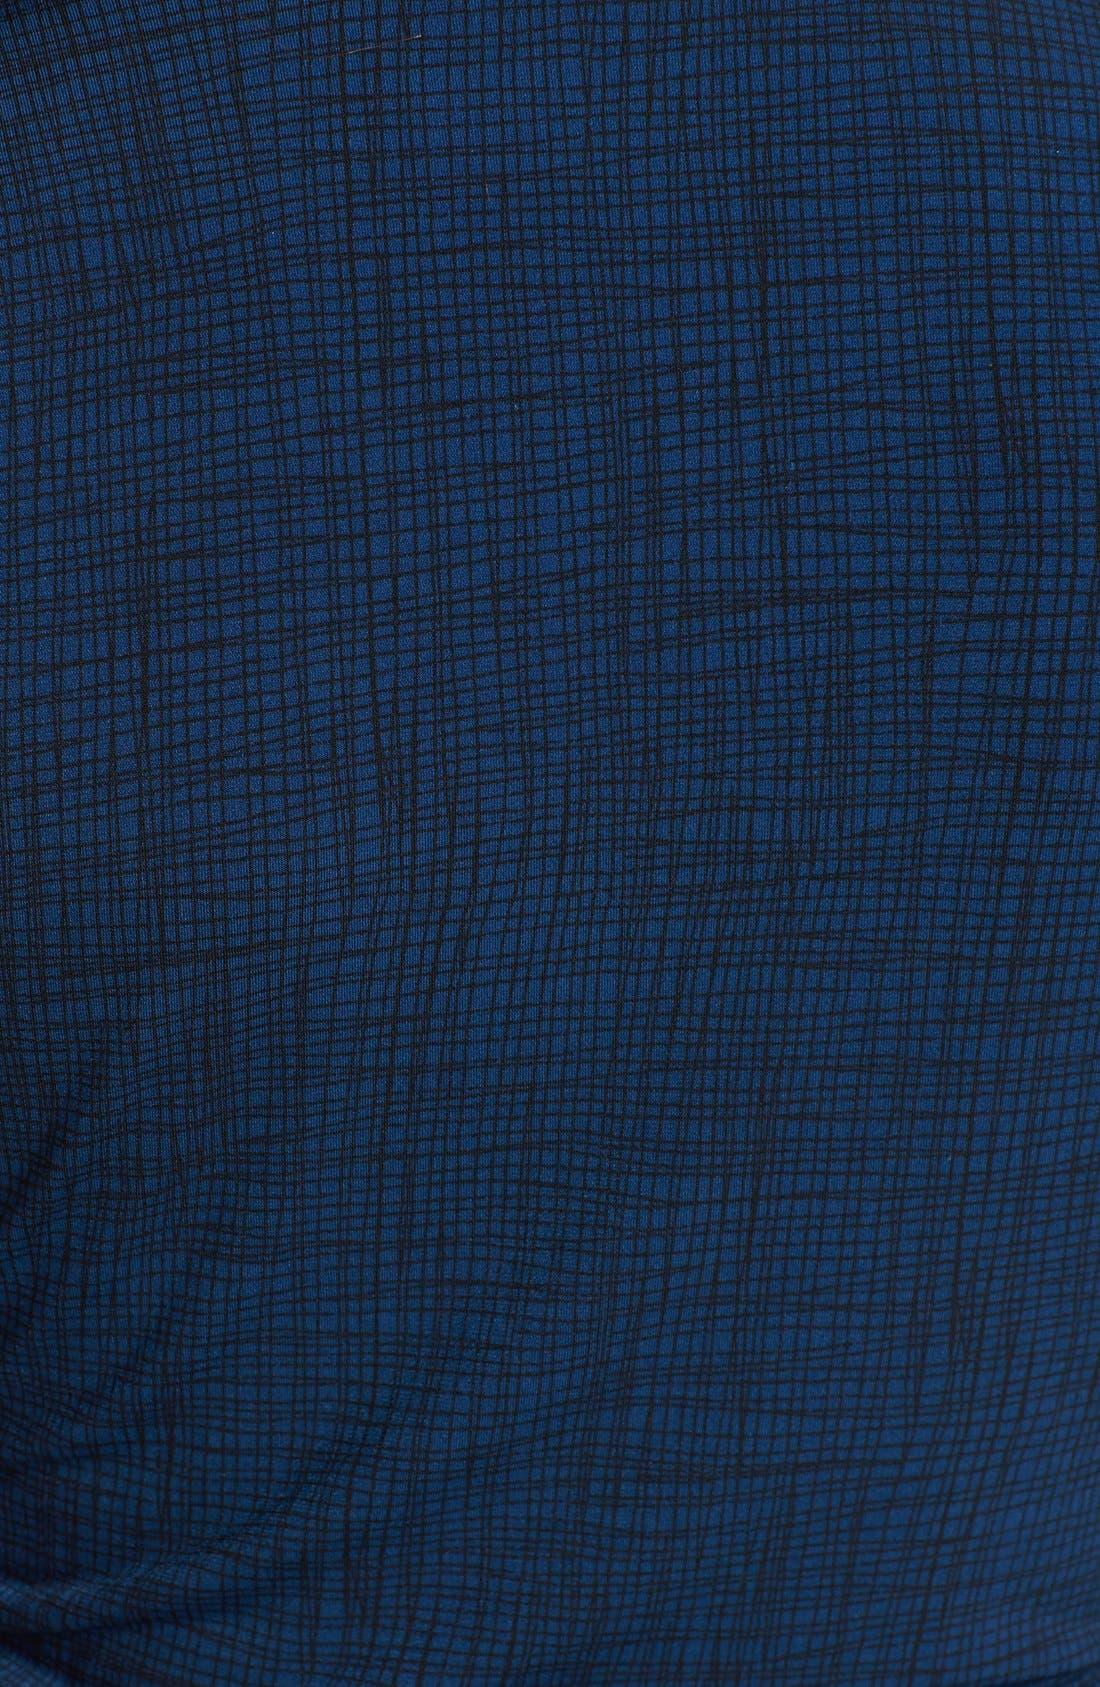 Alternate Image 3  - Vince Camuto Print Pleat V-Neck Top (Regular & Petite)